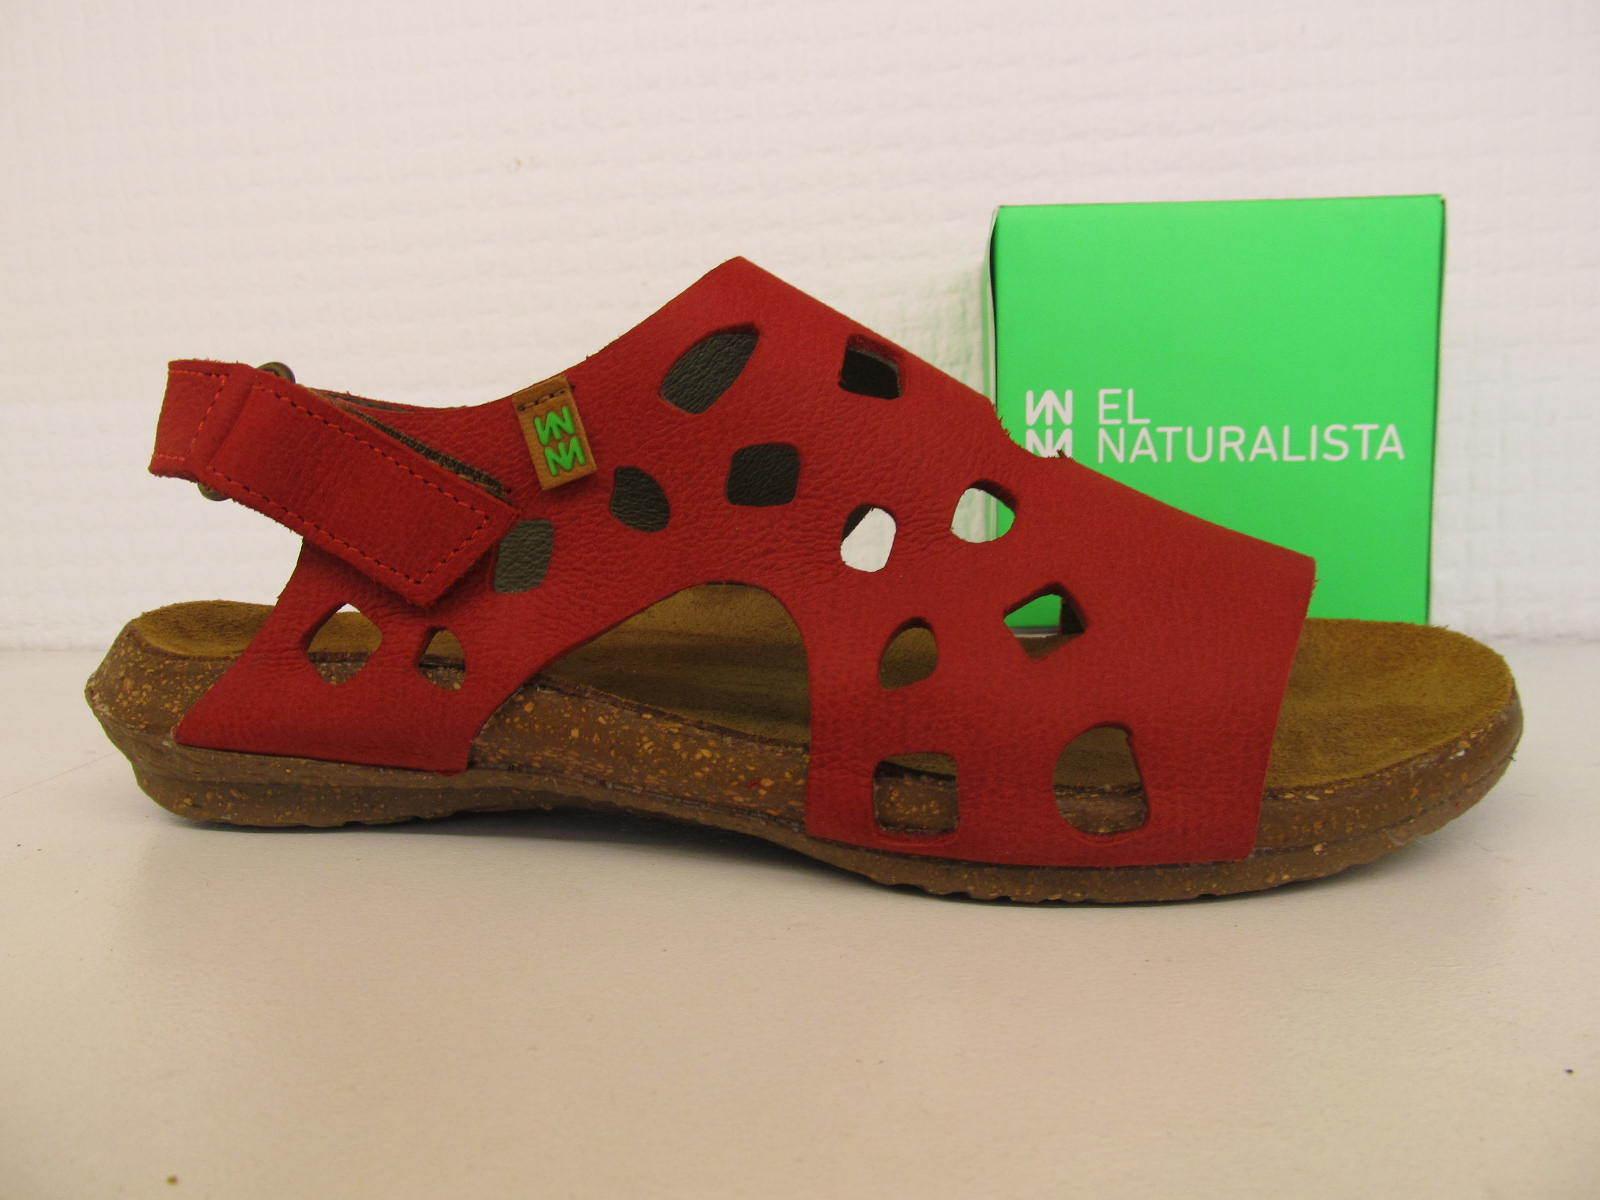 El agradable De naturalista N5061 wakataua agradable El Tíbet Sandalia Zapato De 2d9a76